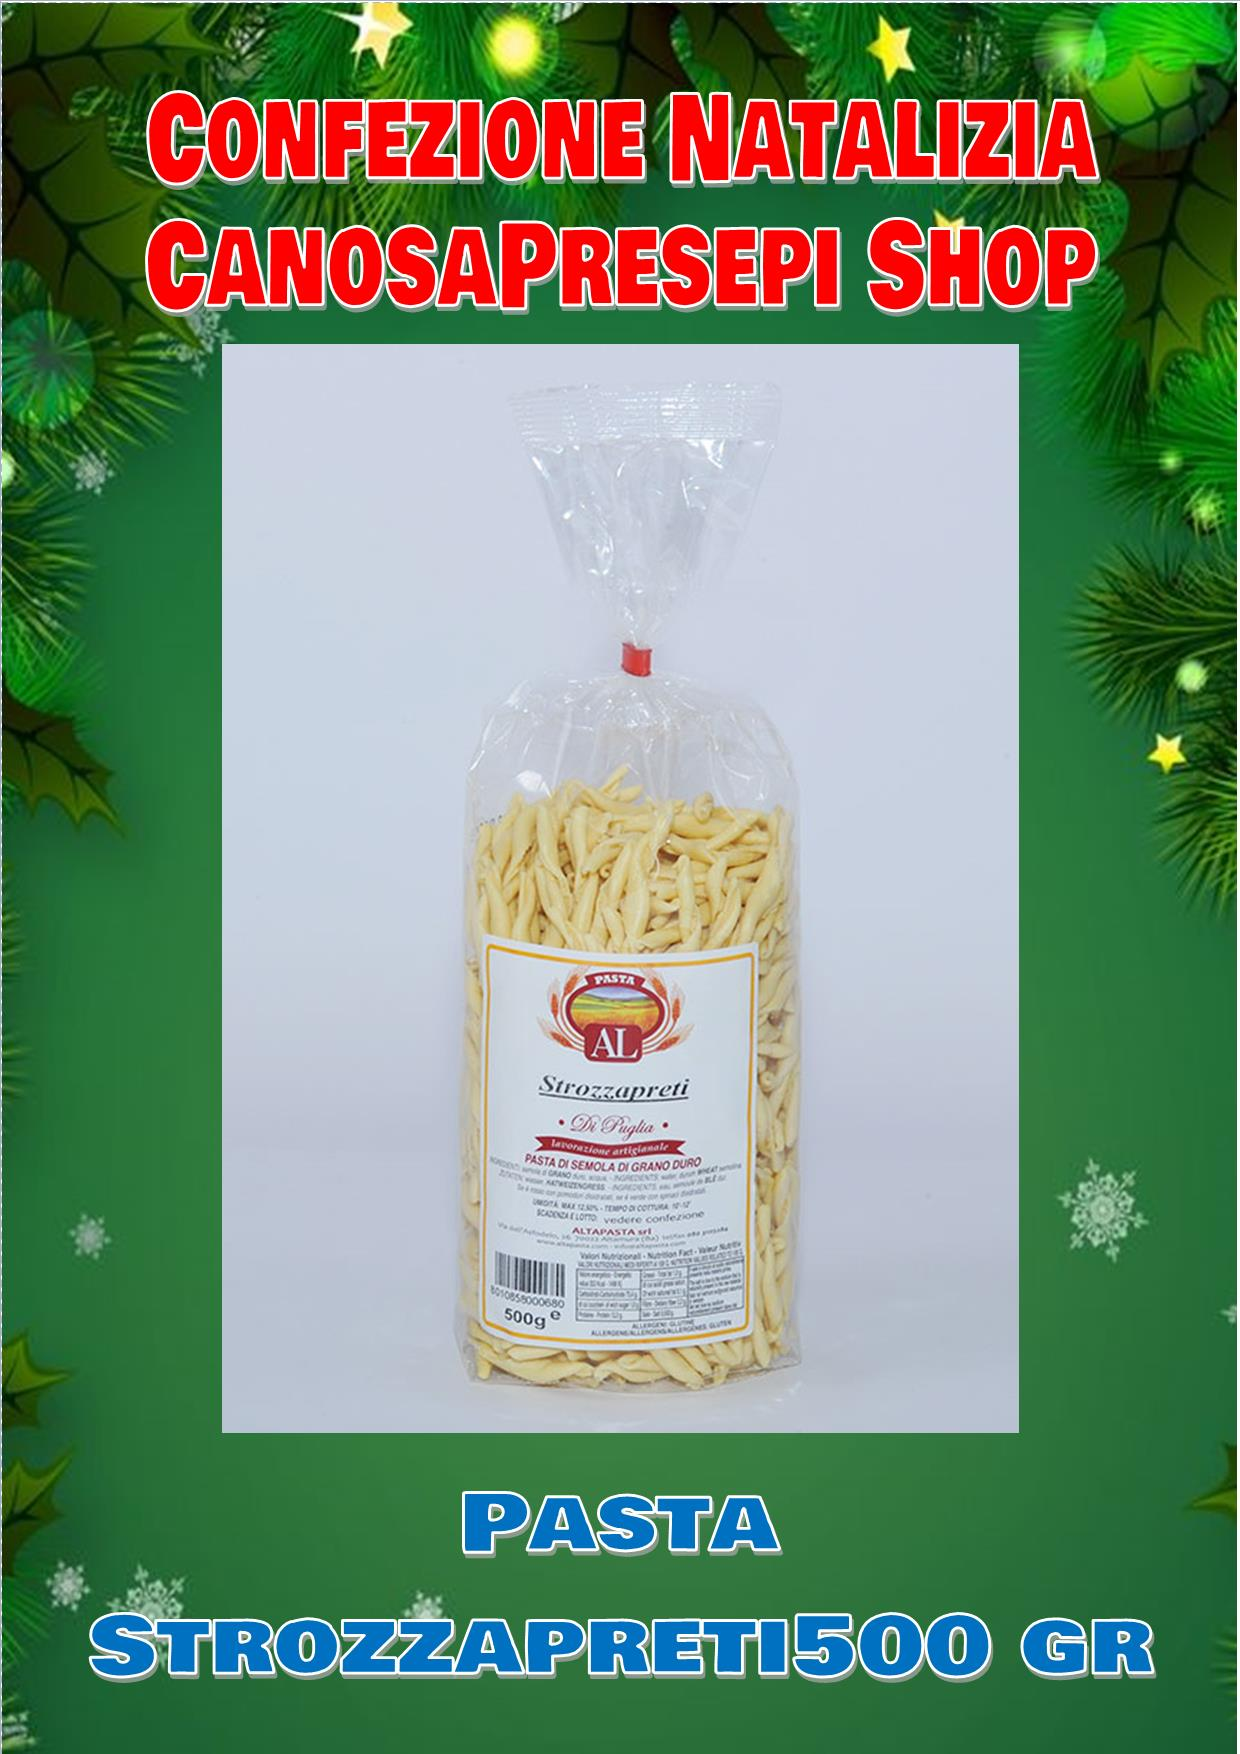 CanosaPresepiShop.3